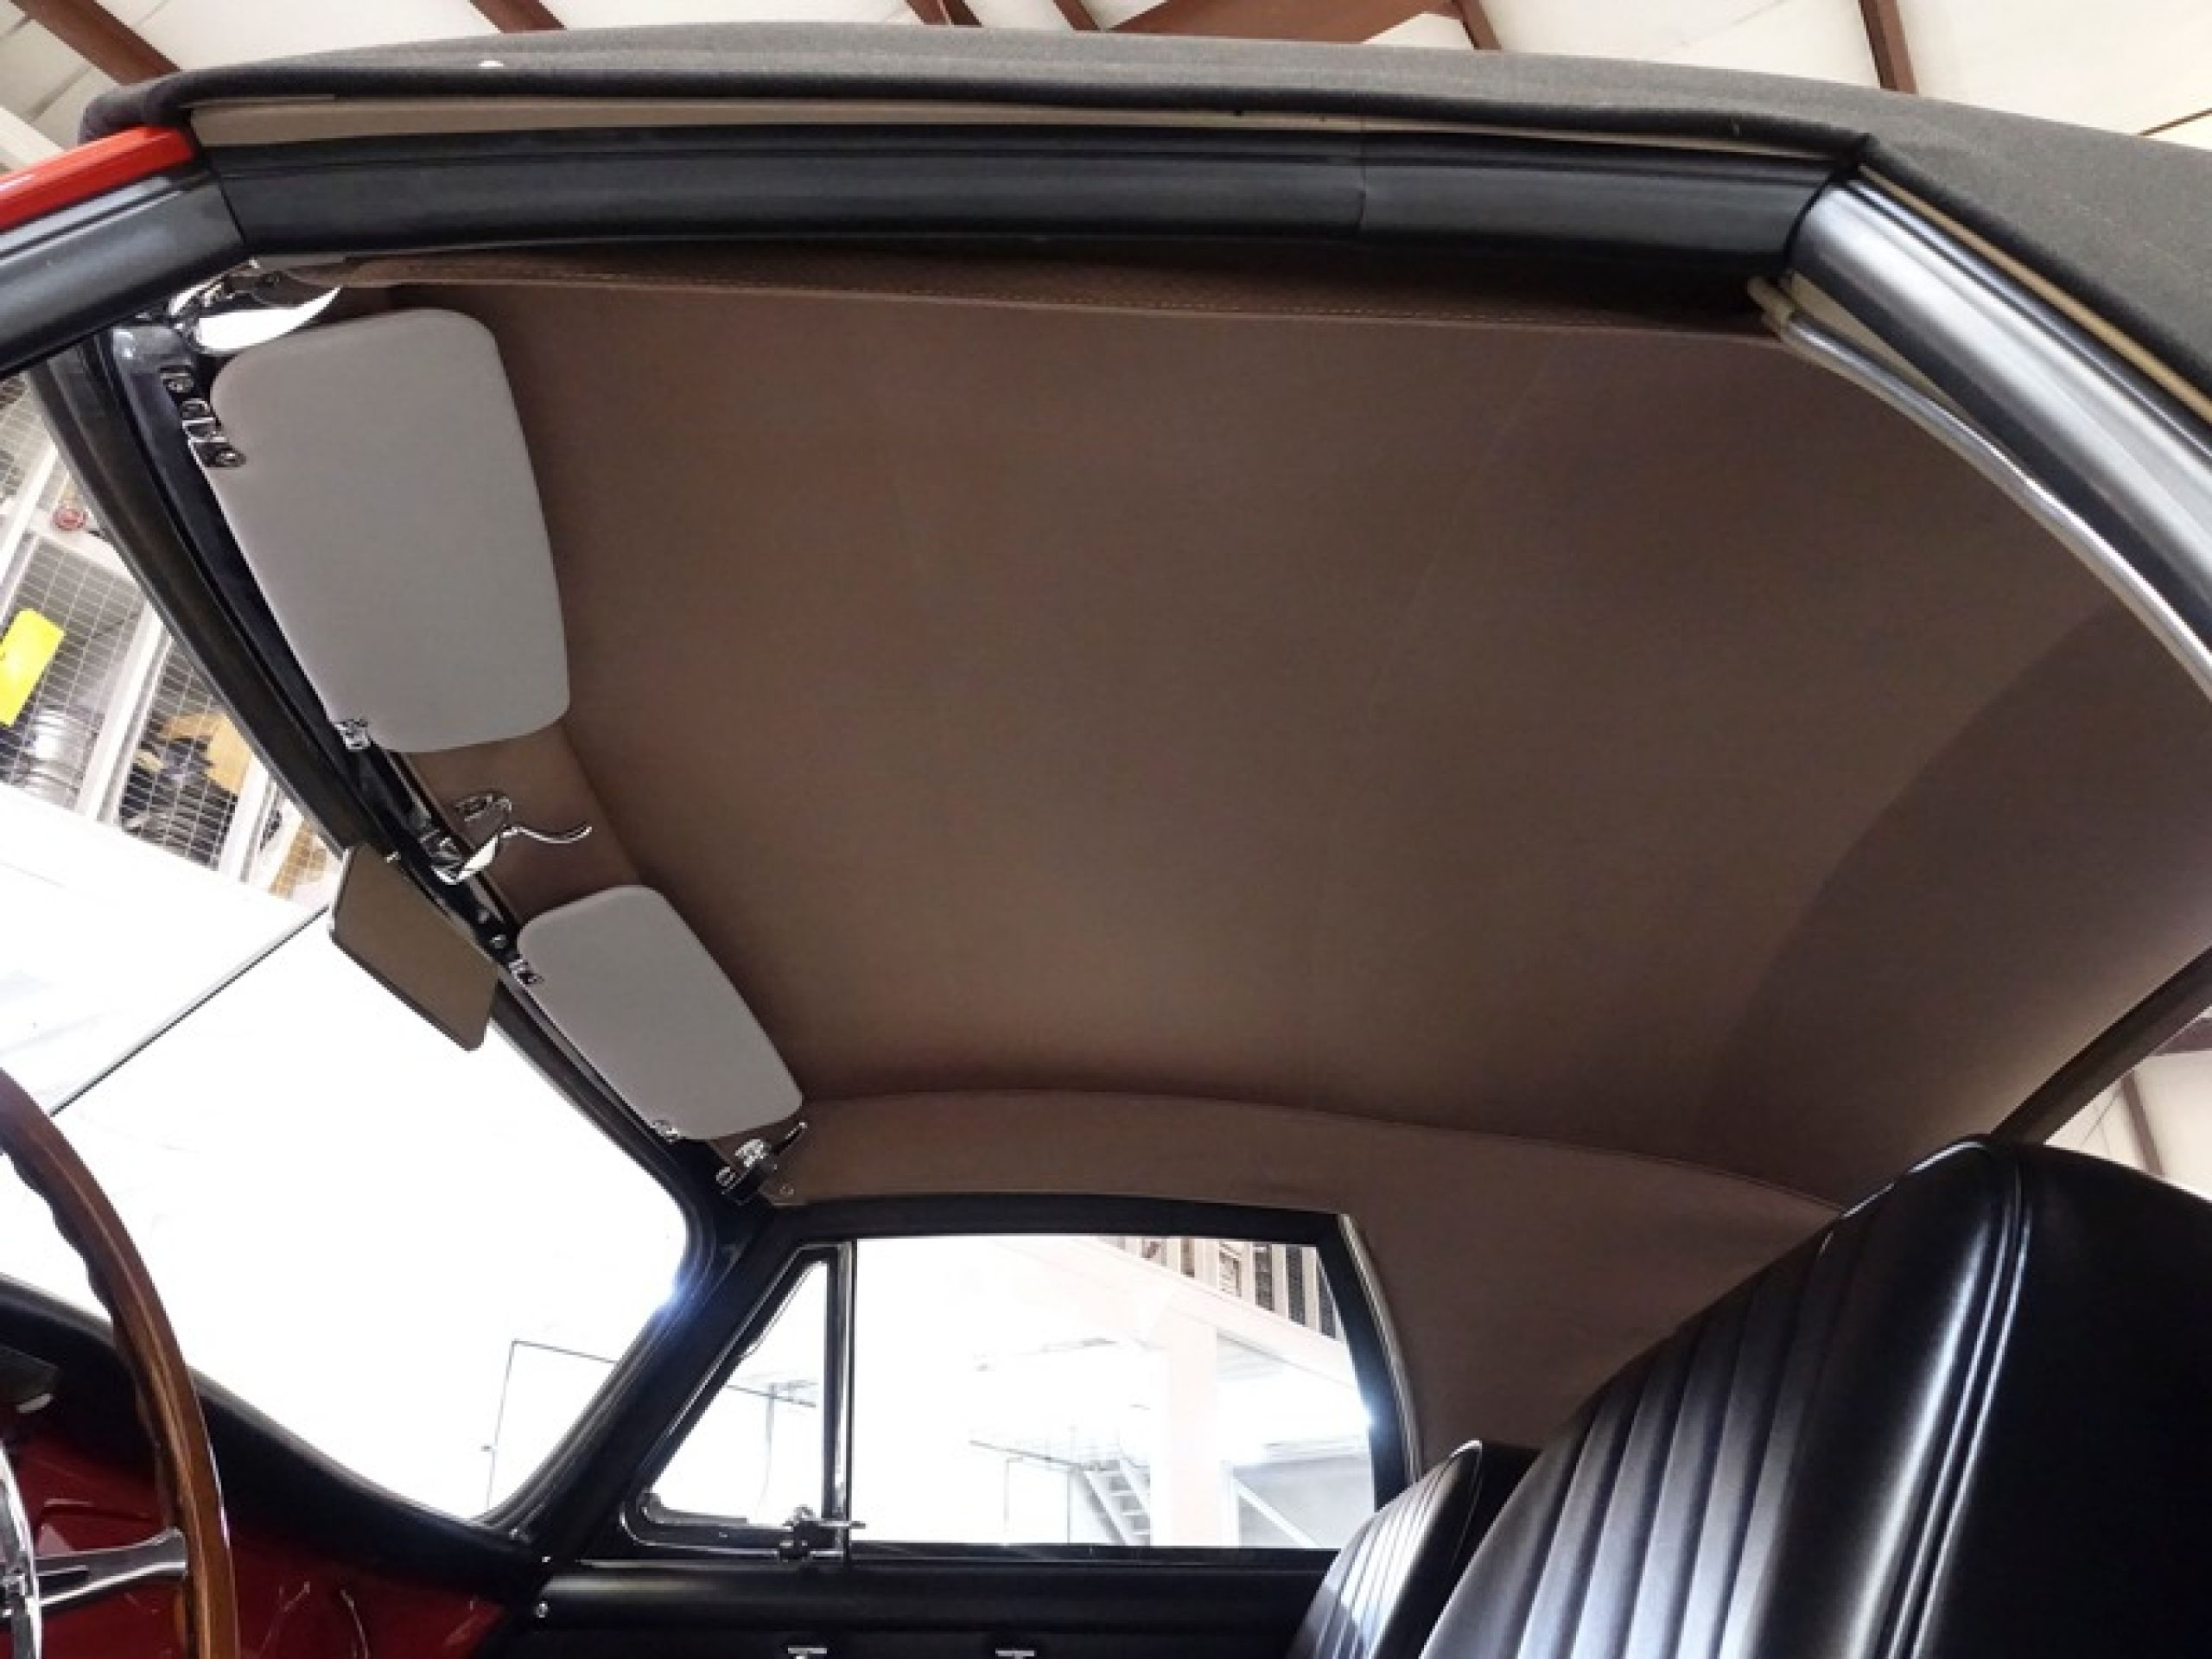 1963 Porsche 356 B Carrera 2 GS Cabriolet